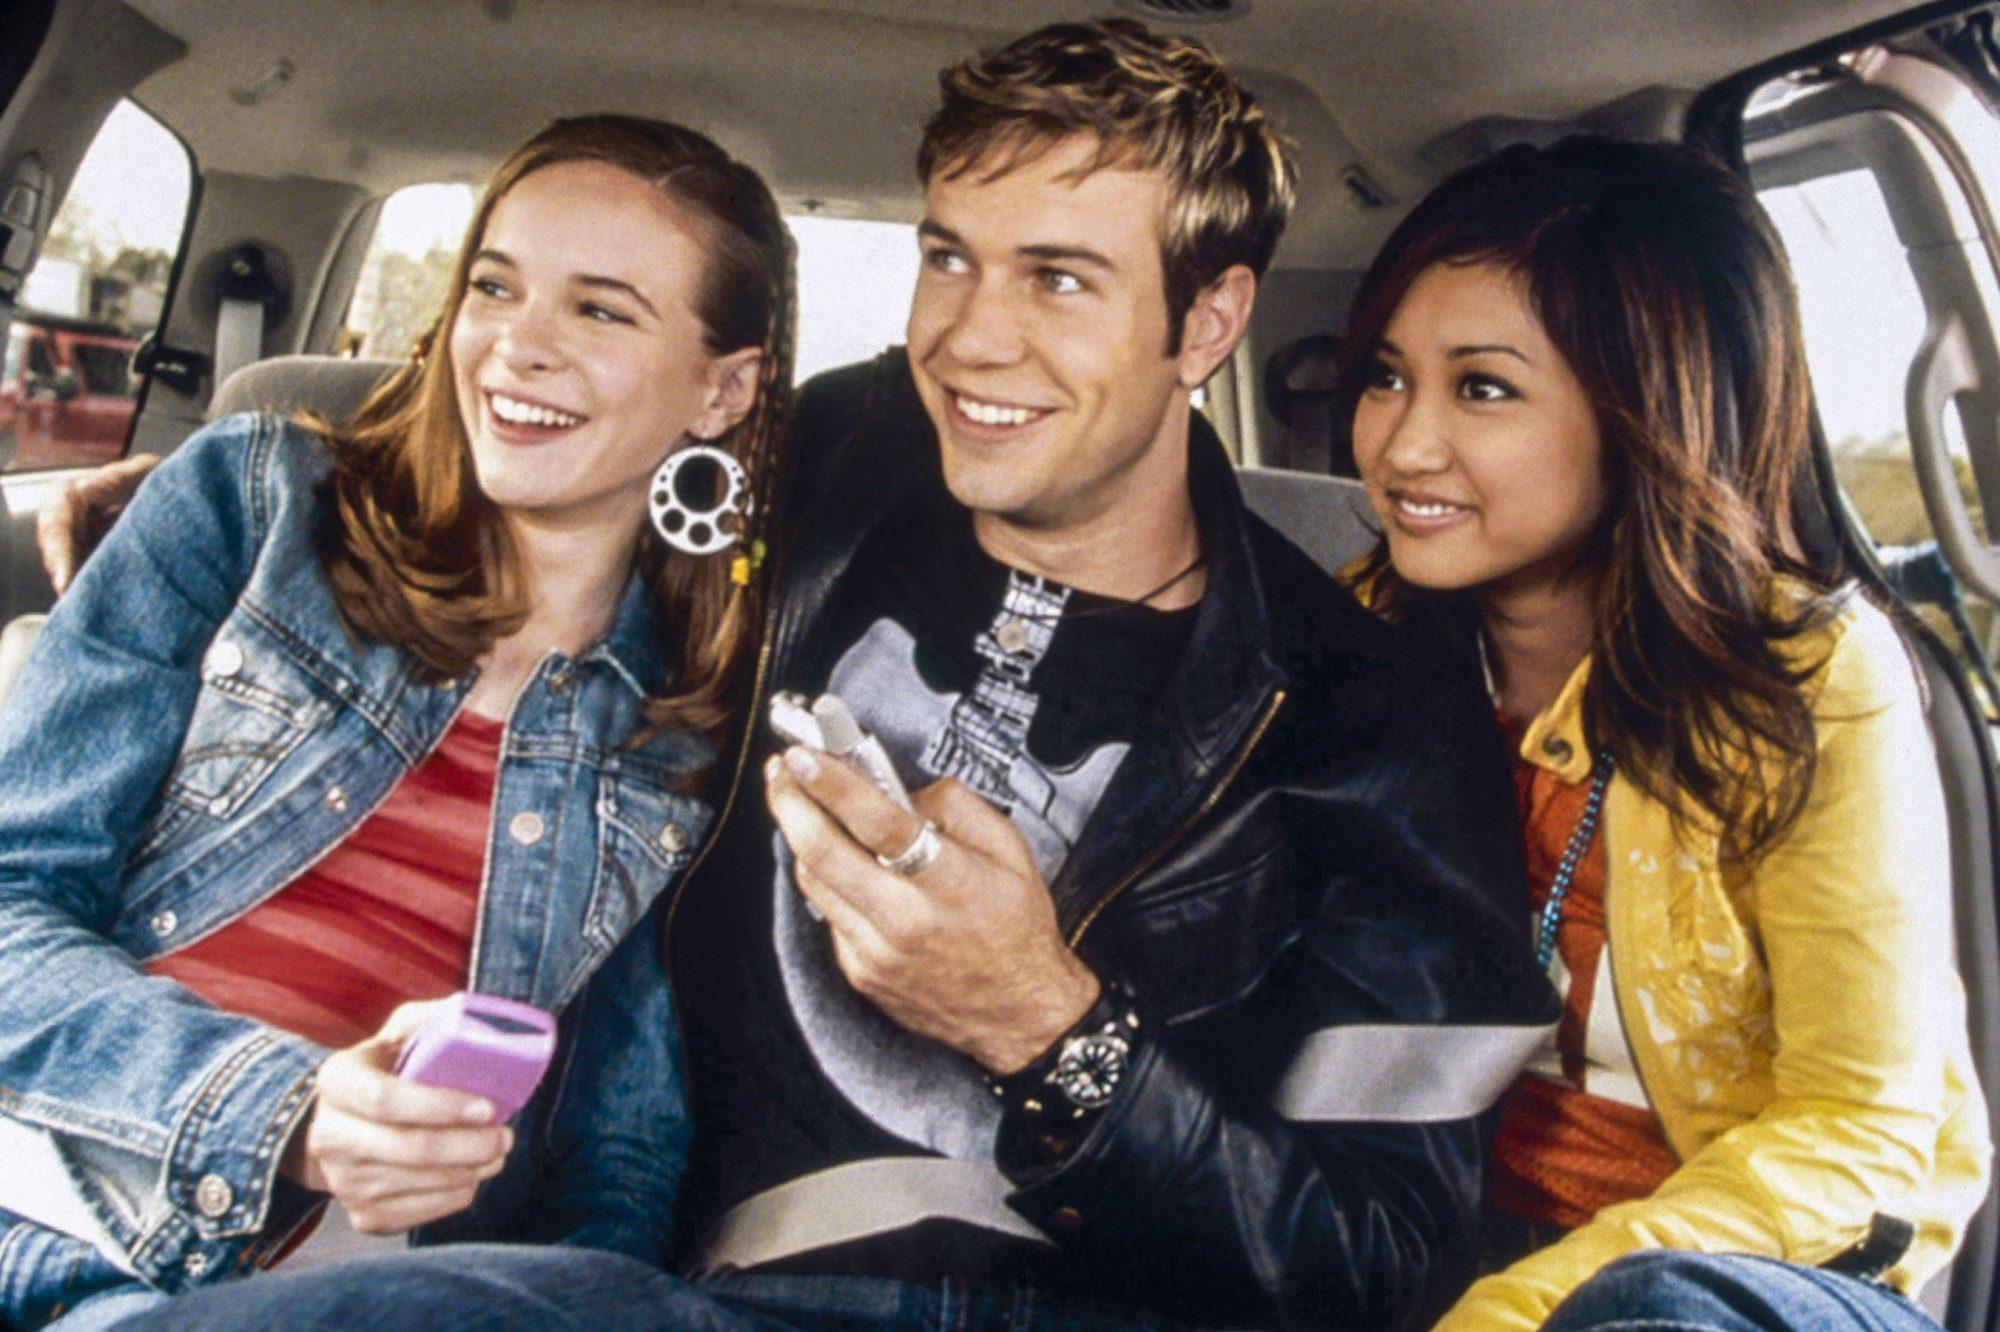 STUCK IN THE SUBURBS, from left: Danielle Panabaker, Taran Killam, Brenda Song, 2004, © Disney